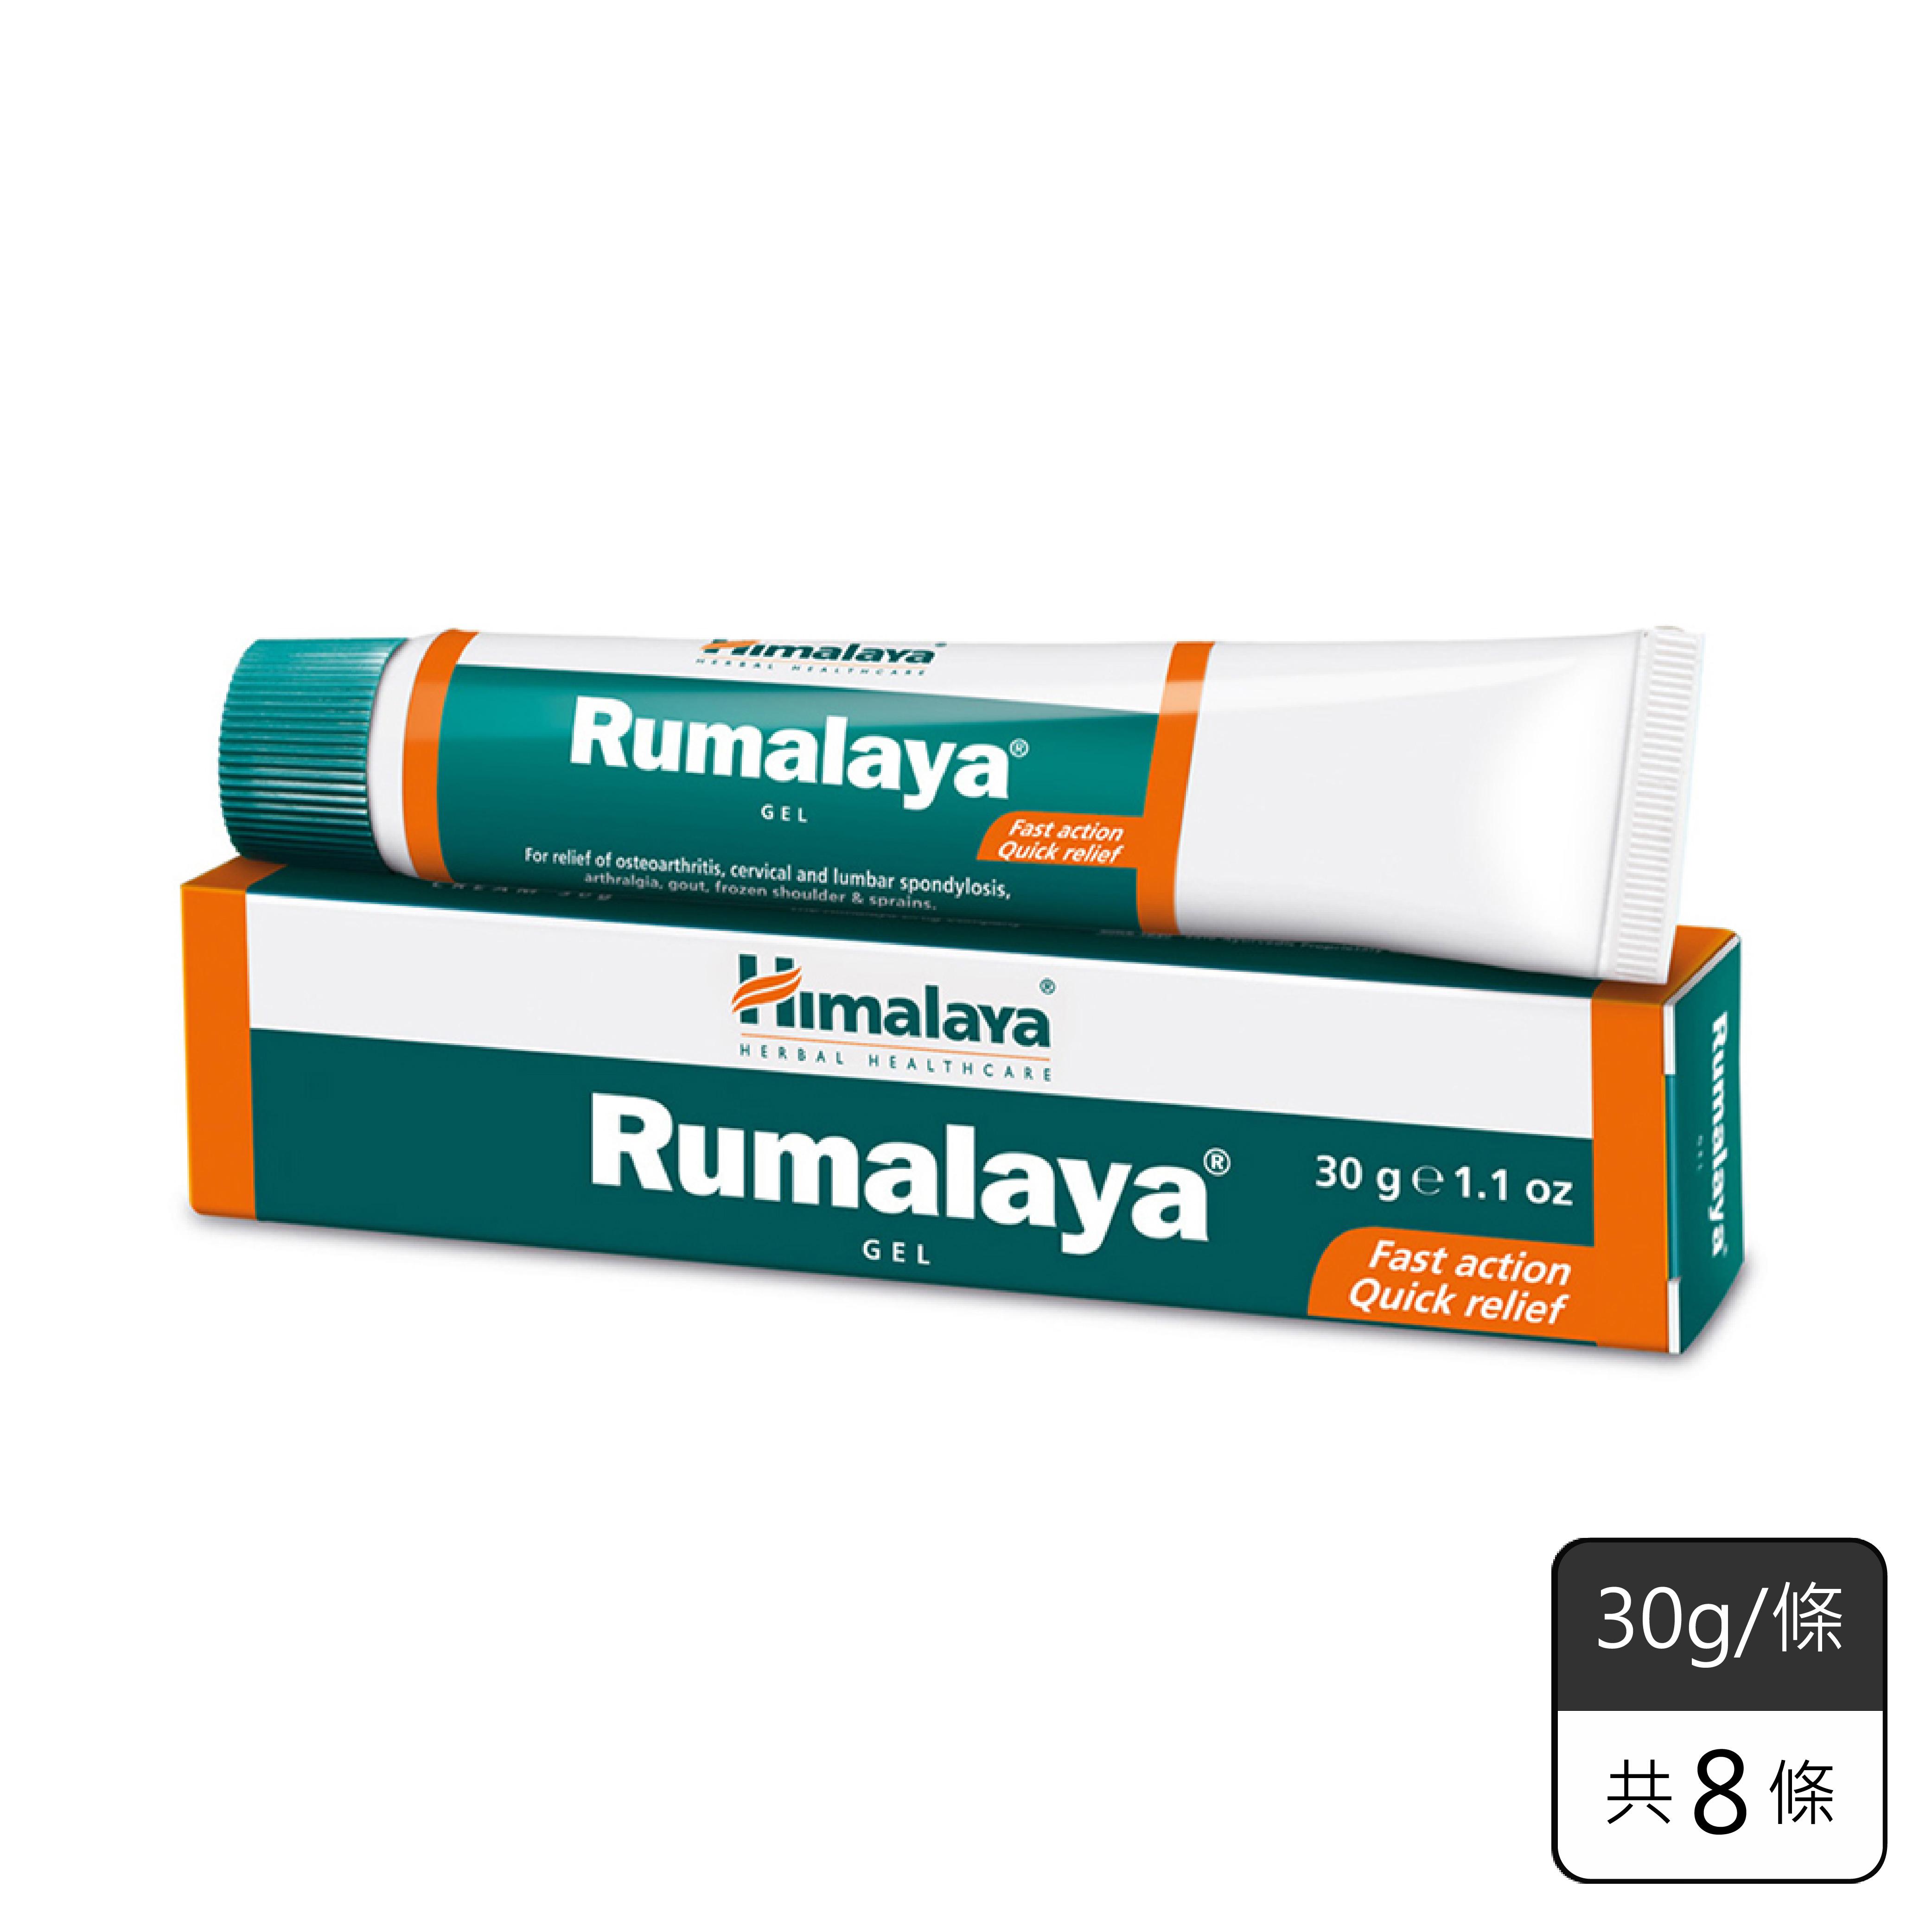 《Himalaya》關鍵奇肌舒緩膏 (30g*8入)